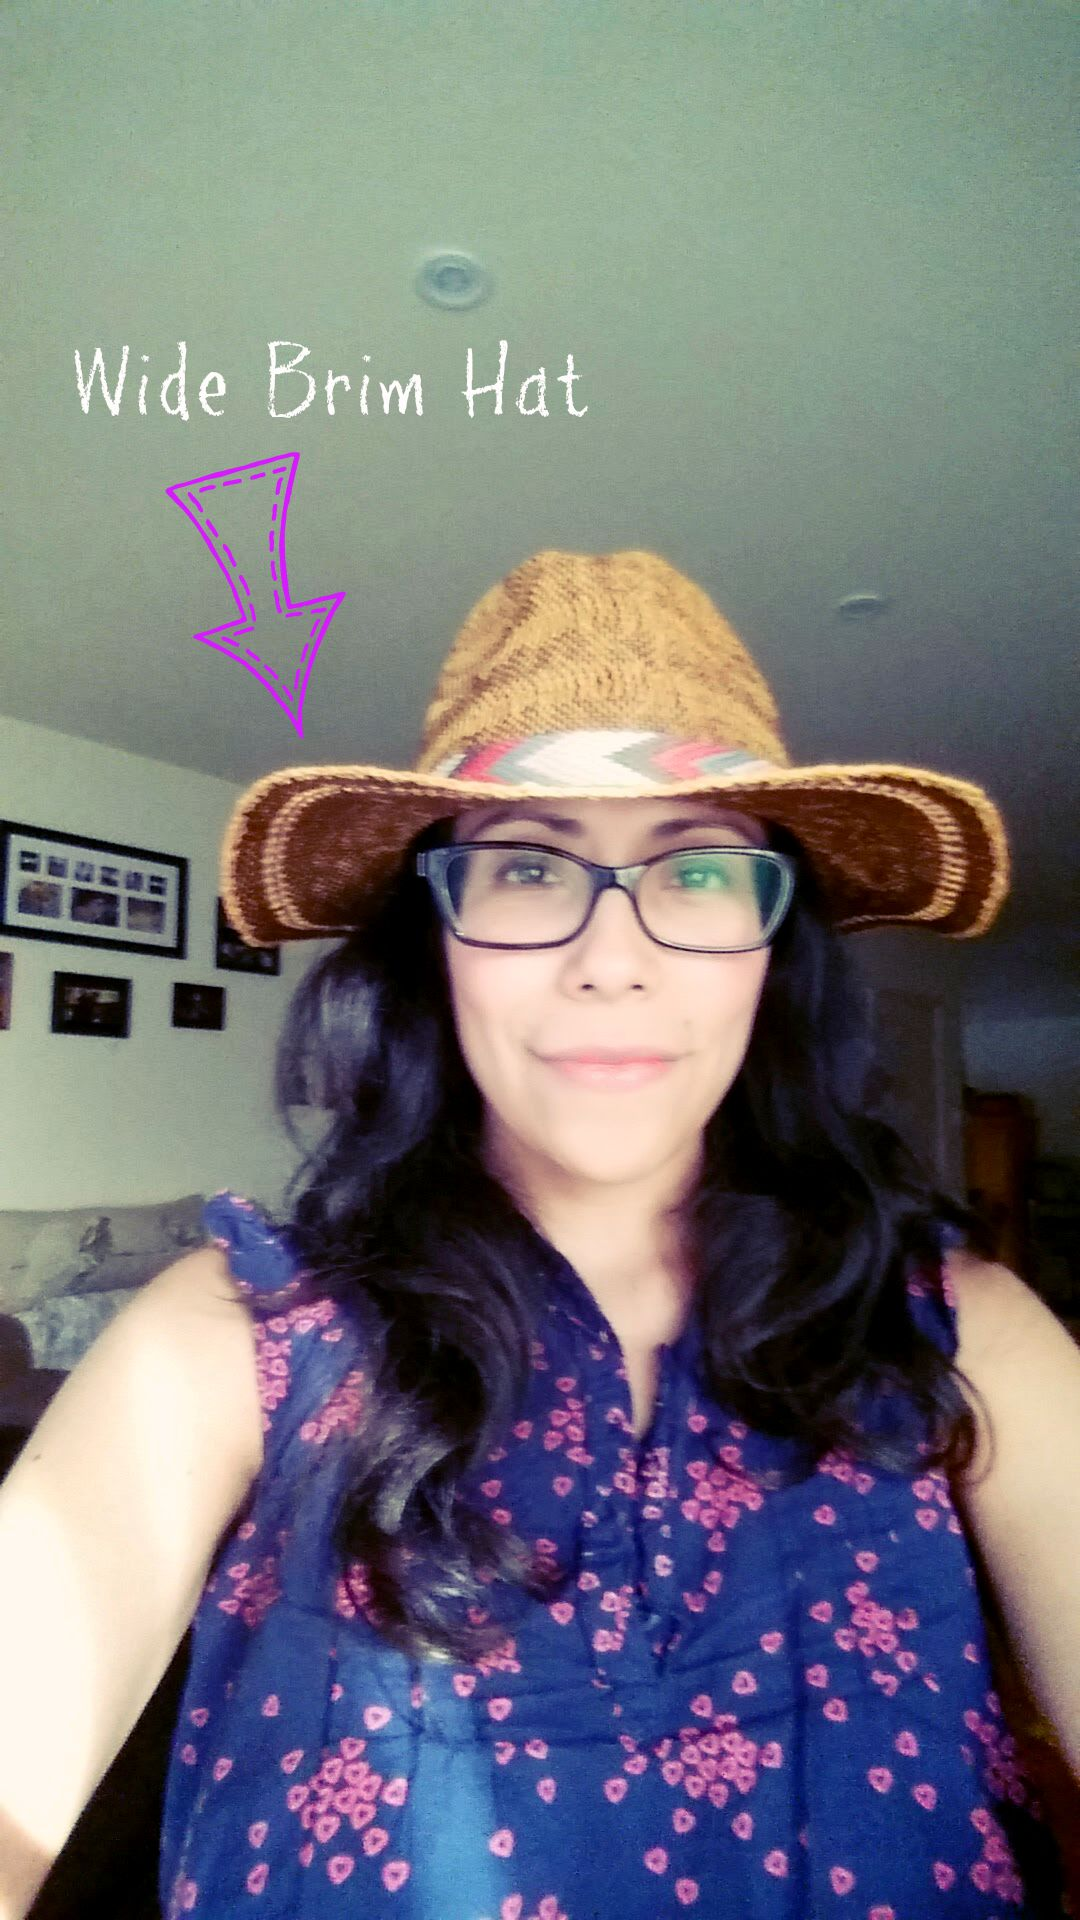 Wide brim straw hat by Roxy